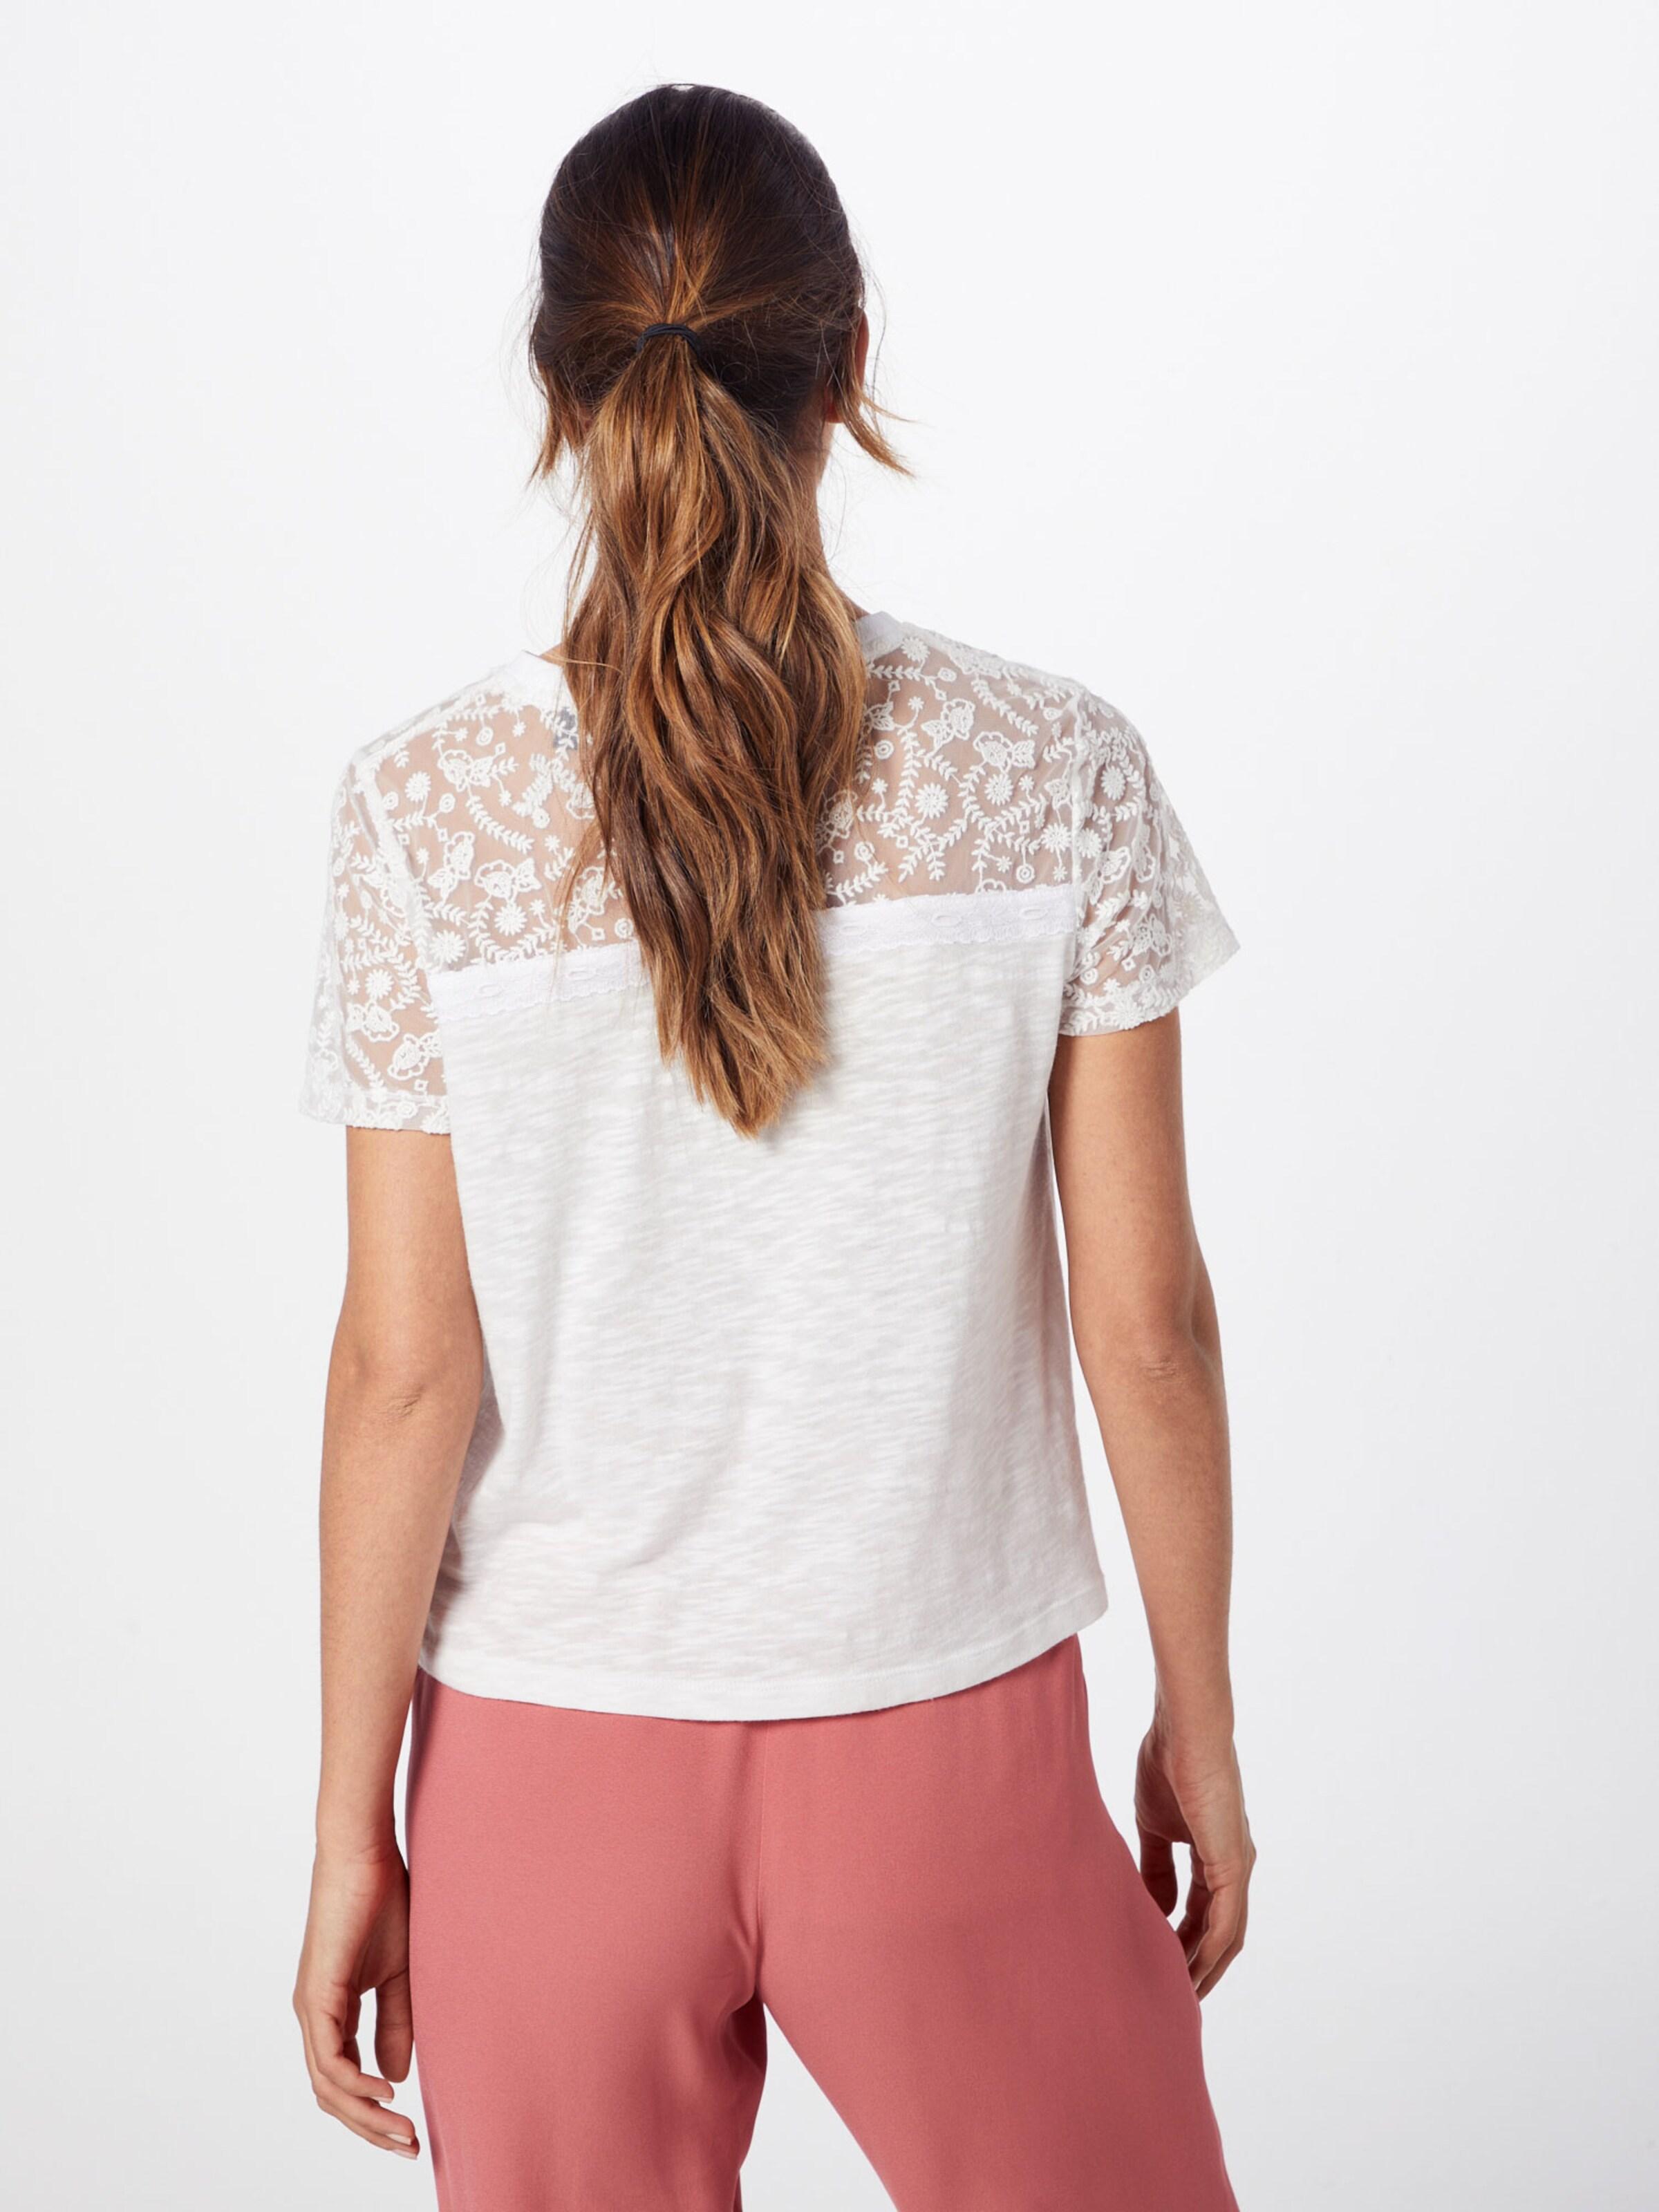 In Emb' Weiß 'rowan Shirt Superdry 34RAL5j